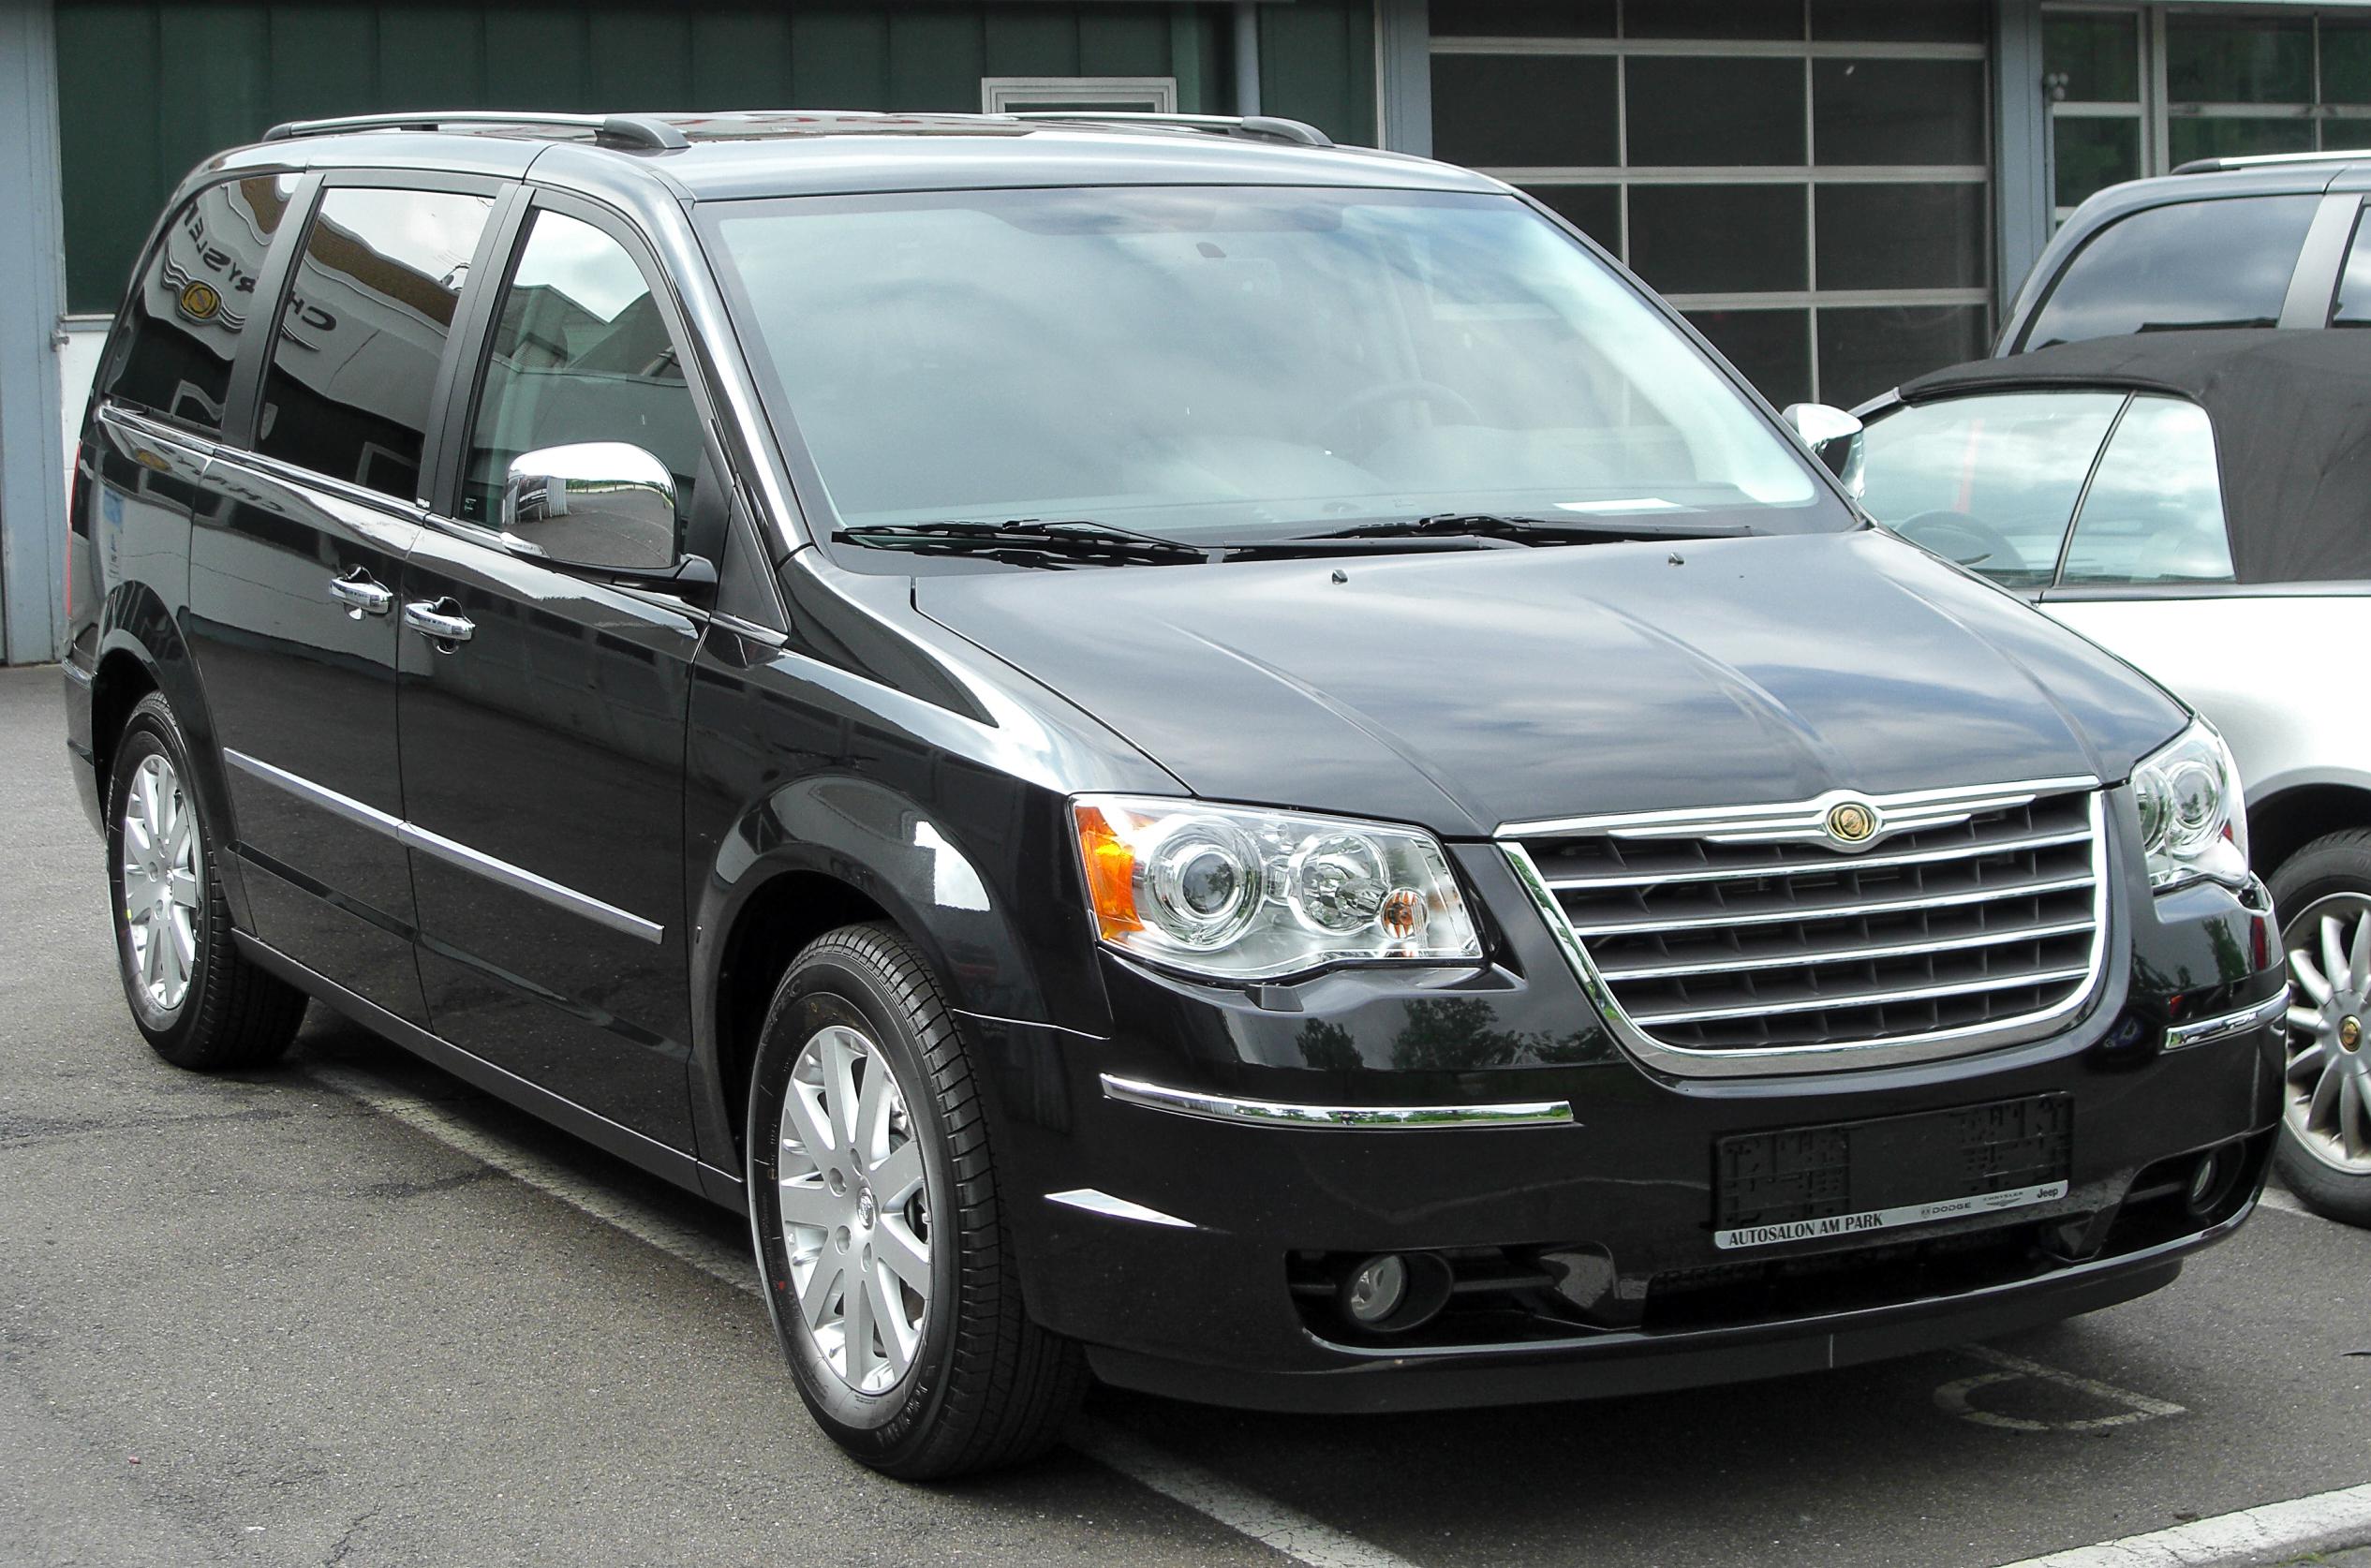 Chrysler Voyager V Restyling 2011 - 2015 Minivan #3